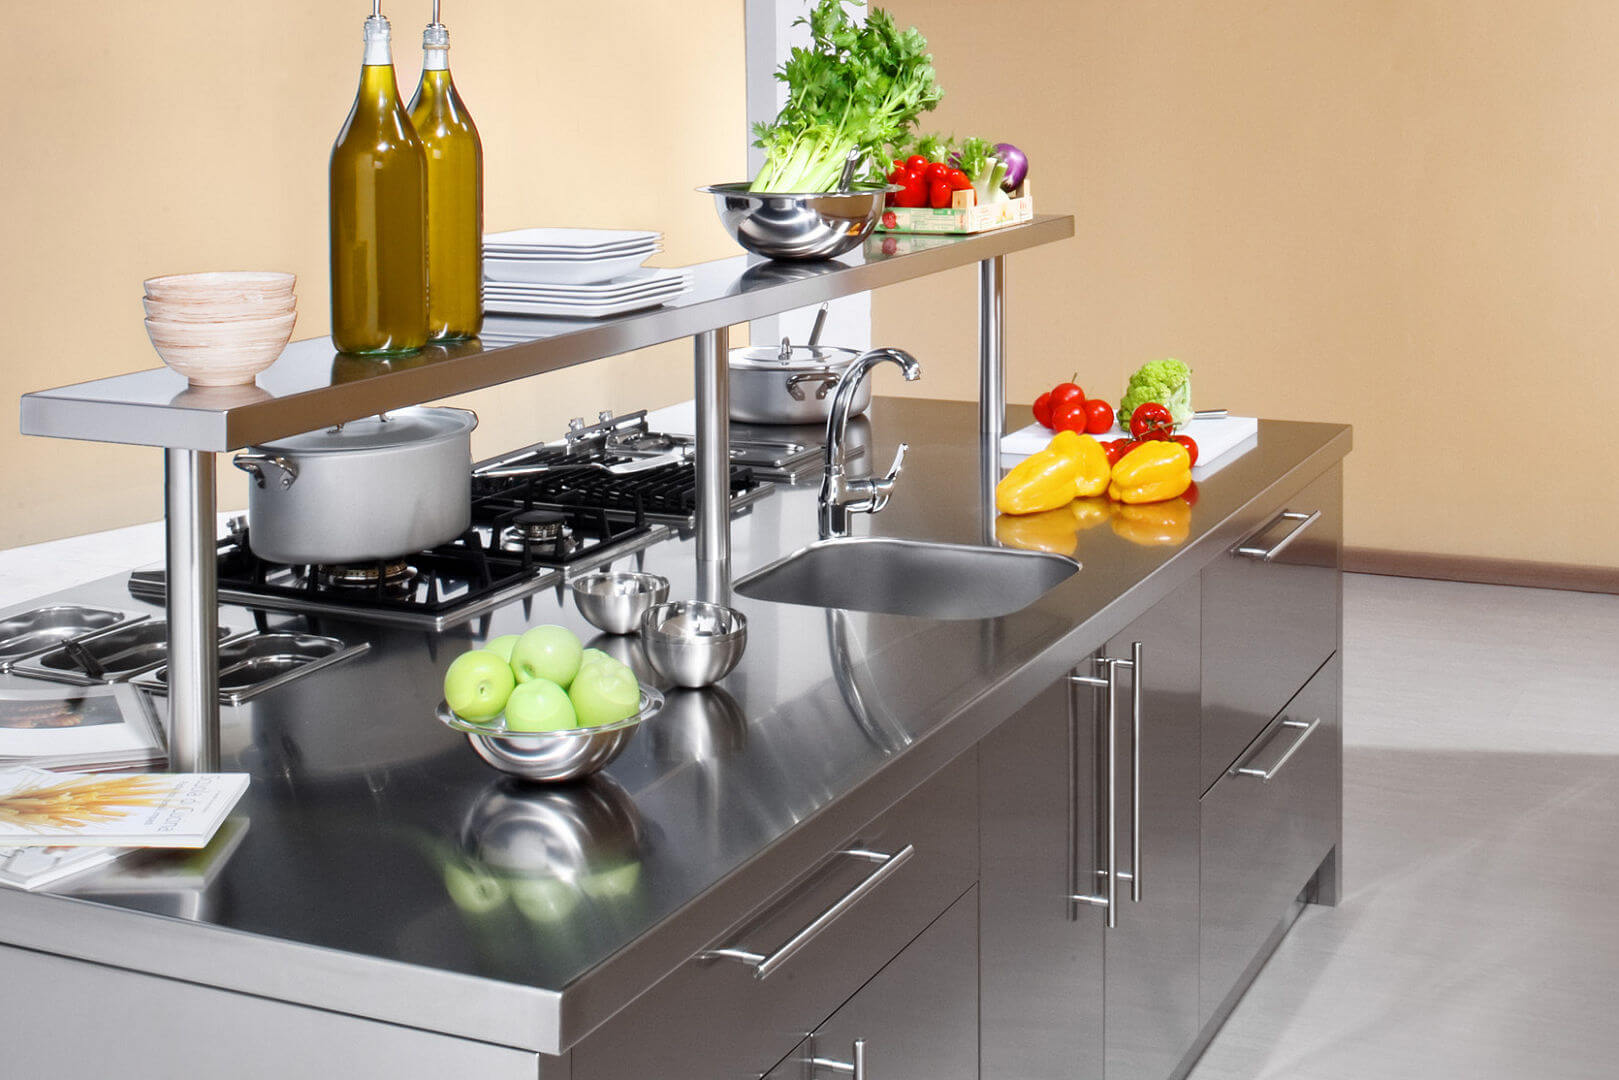 Top cucina acciaio inox prezzo beautiful offerte outlet cucine top cucina acciaio inox a prezzi - Top cucina acciaio inox prezzo ...